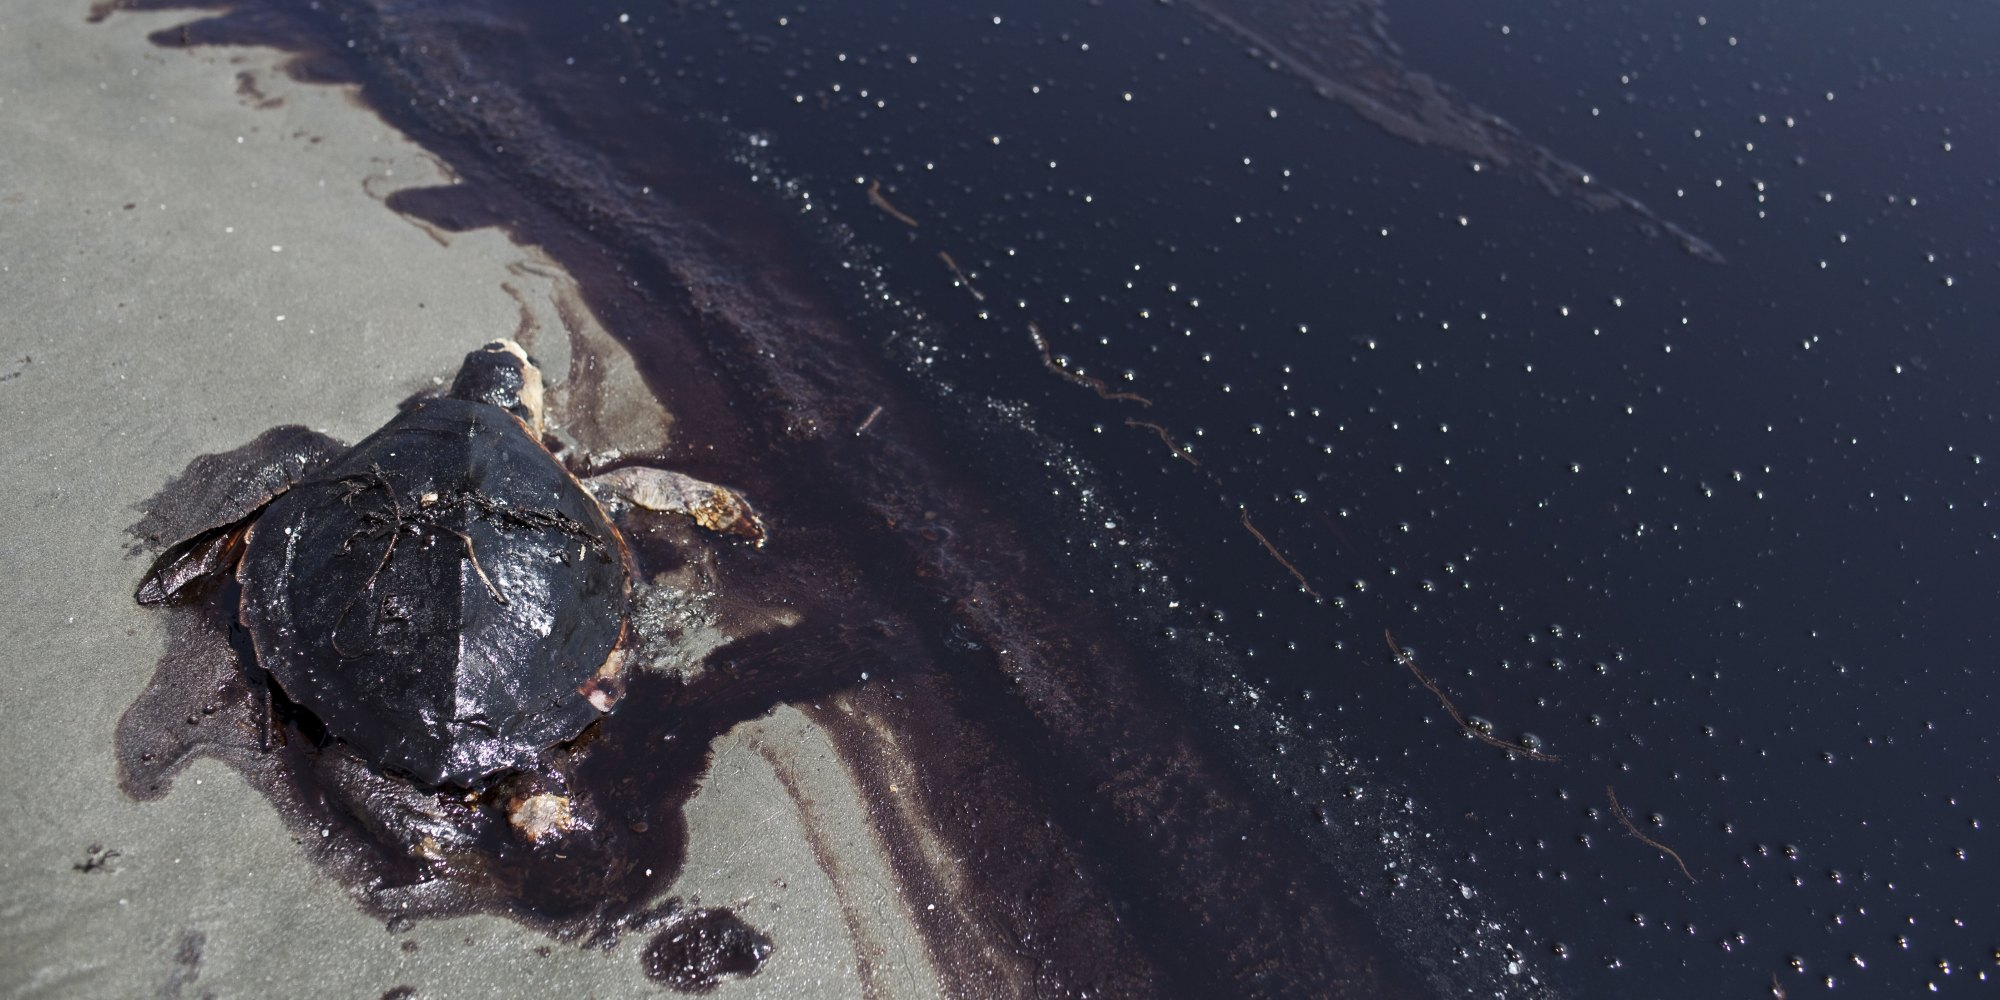 Turtle in Oil Spill.jpg